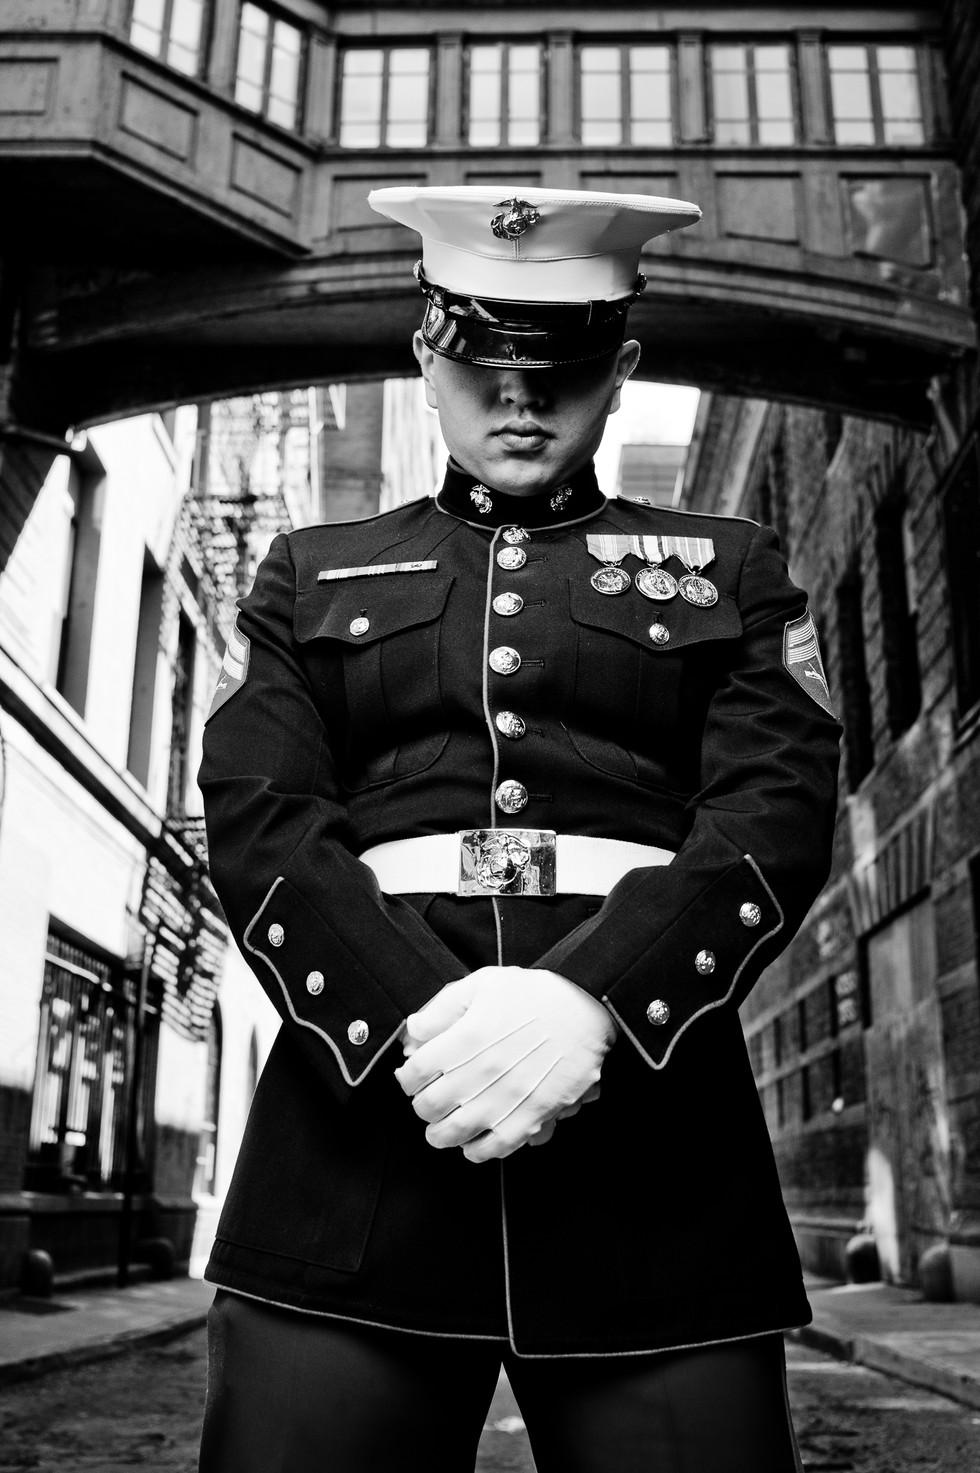 Staple St 09 - Michael C - War Veteran -